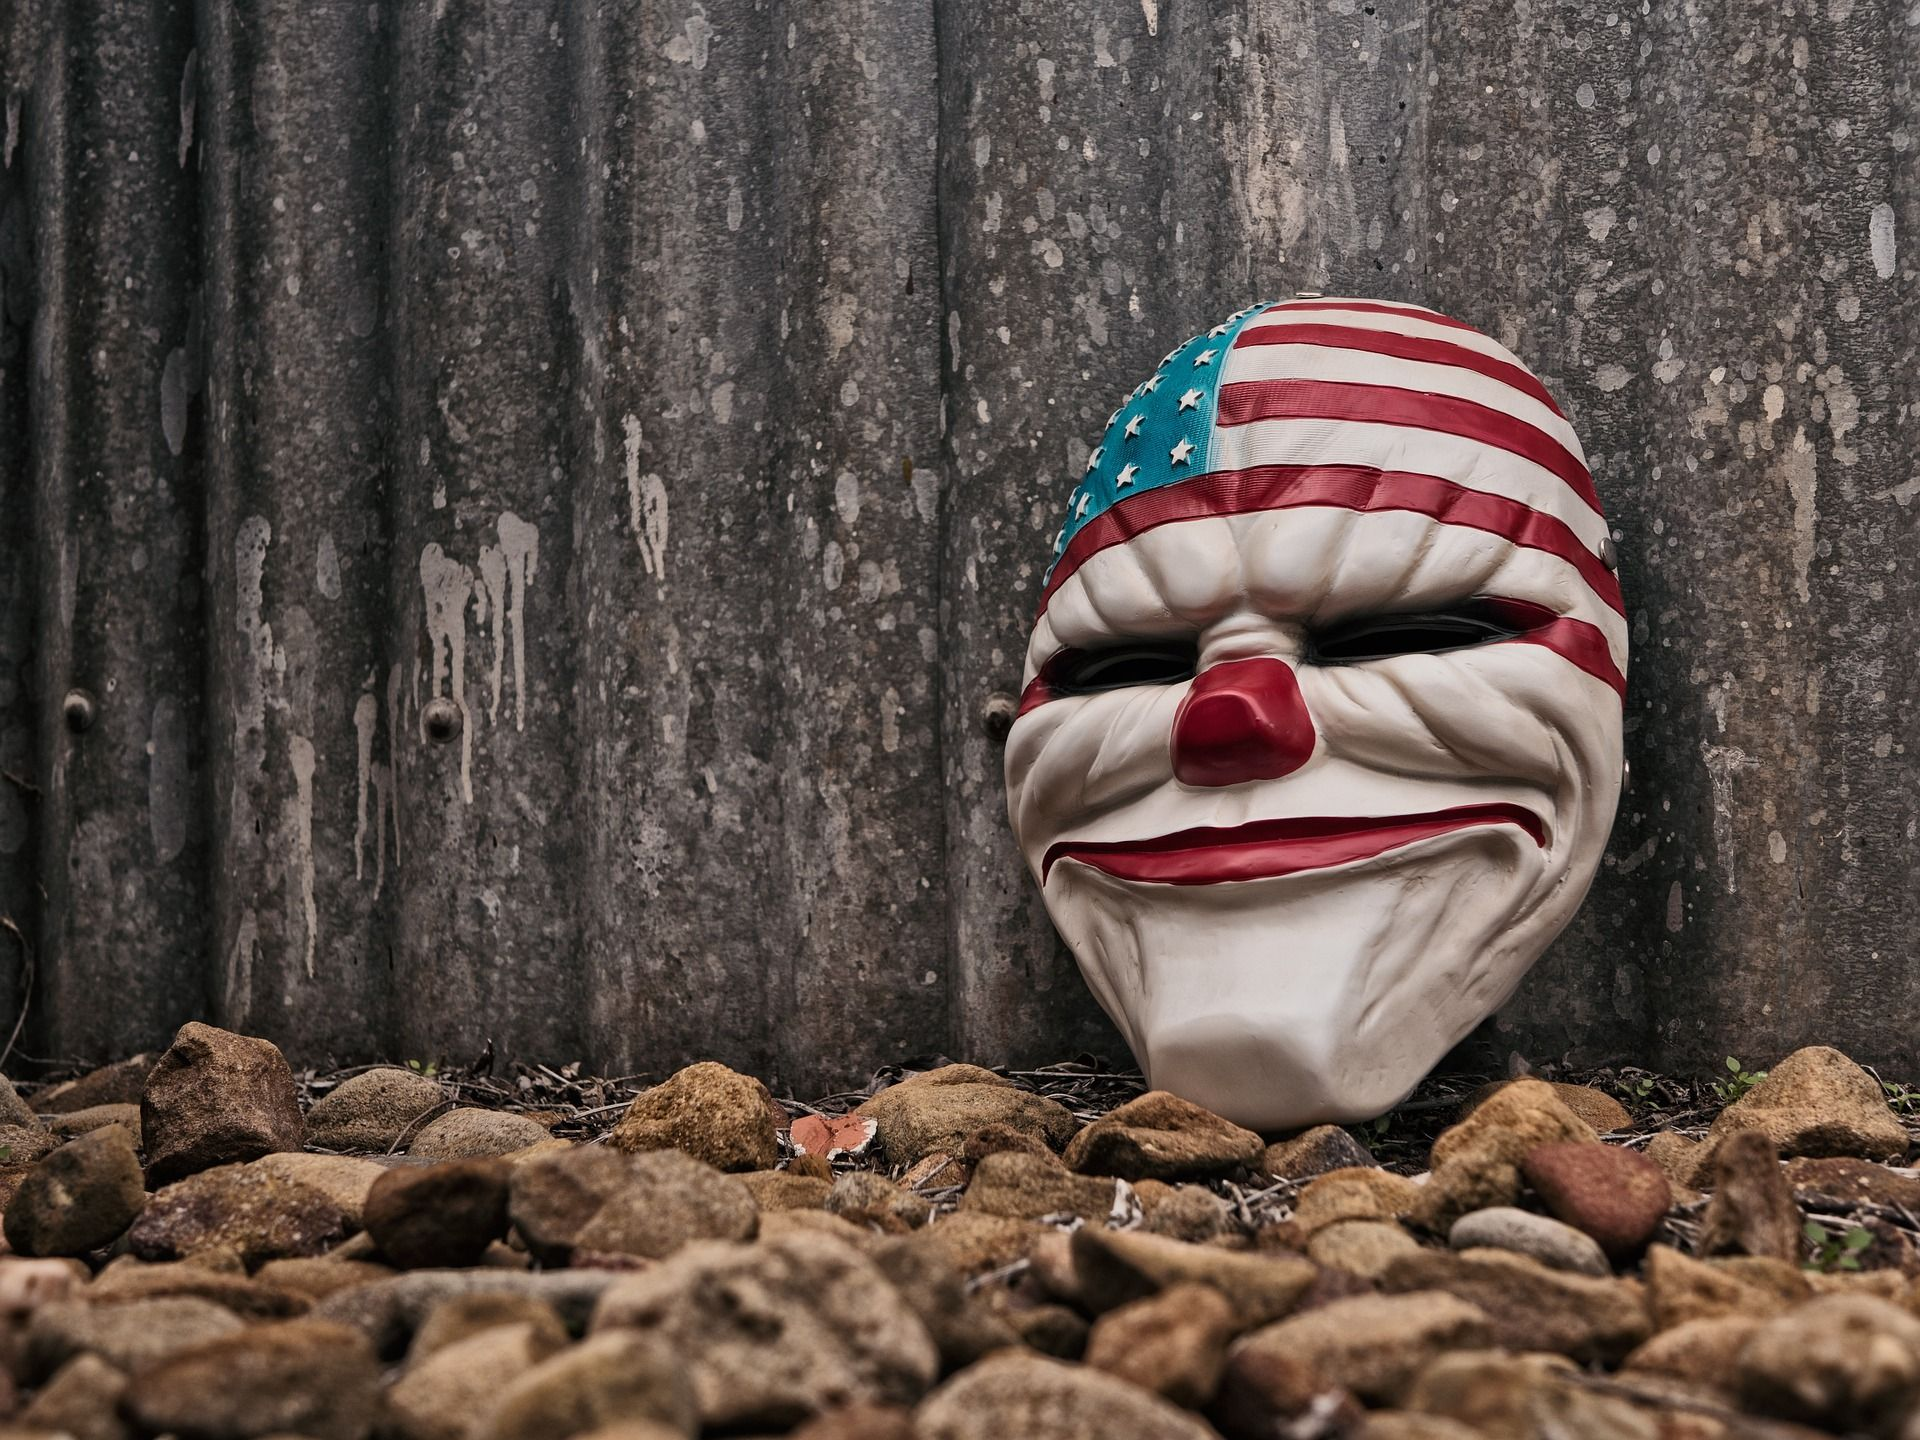 payaso, máscara, carnaval, horror, playa - Fondos de Pantalla HD - professor-falken.com